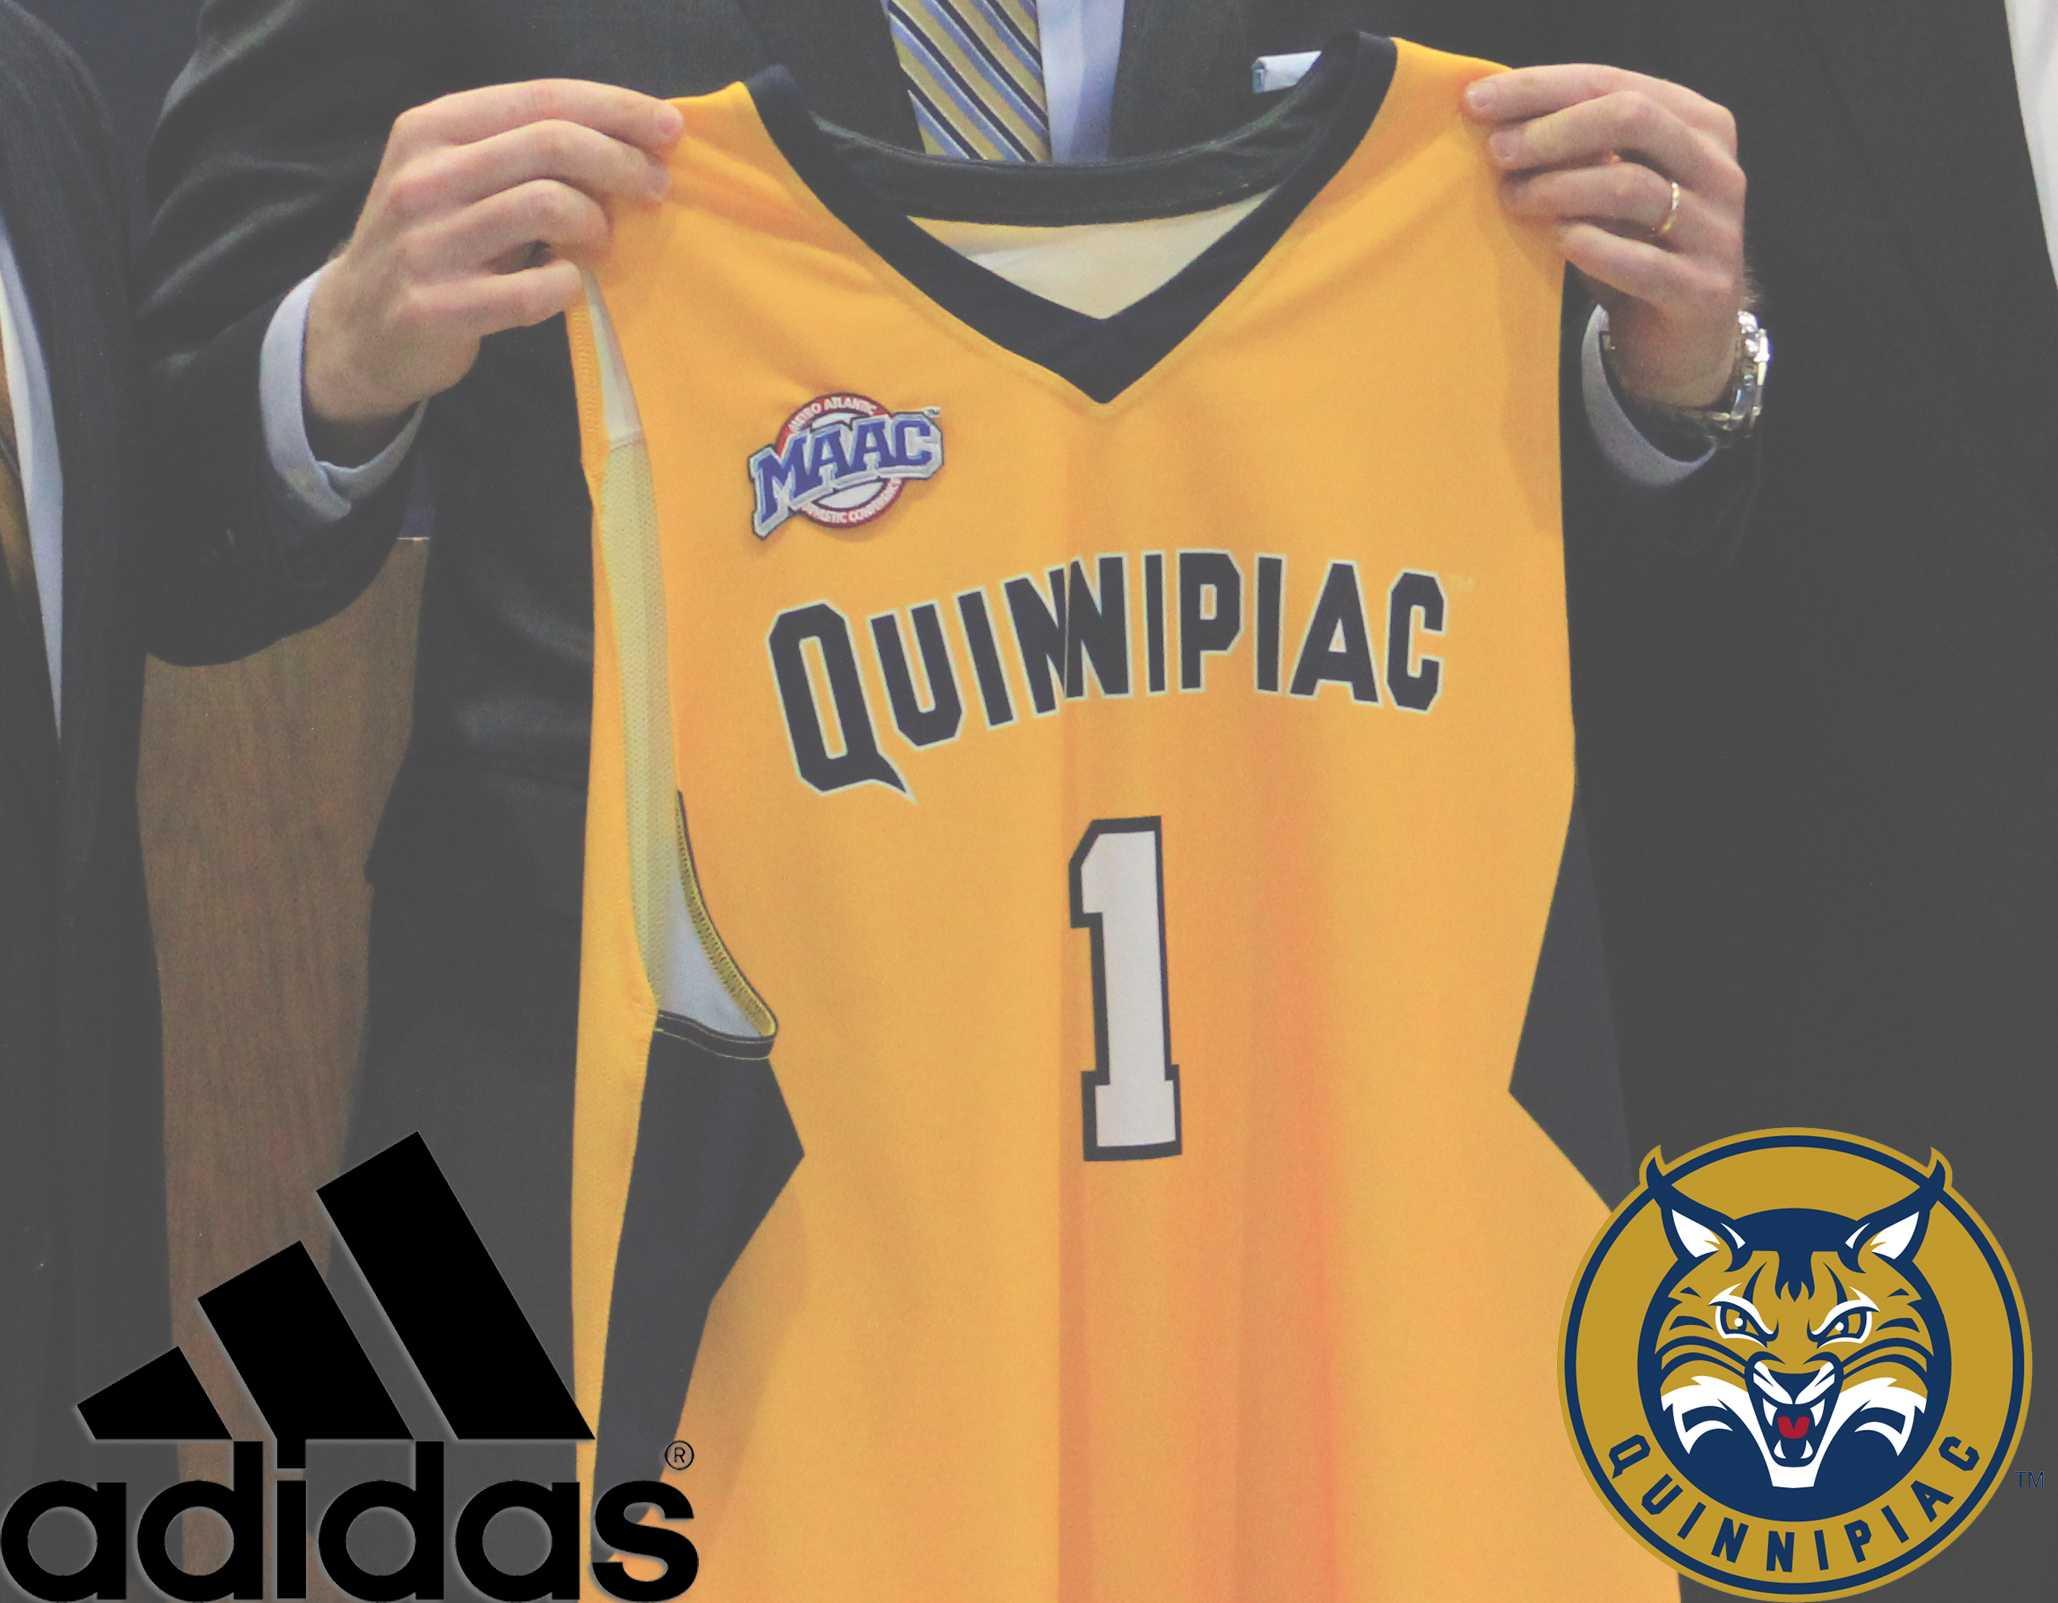 Quinnipiac, adidas announce seven-year partnership